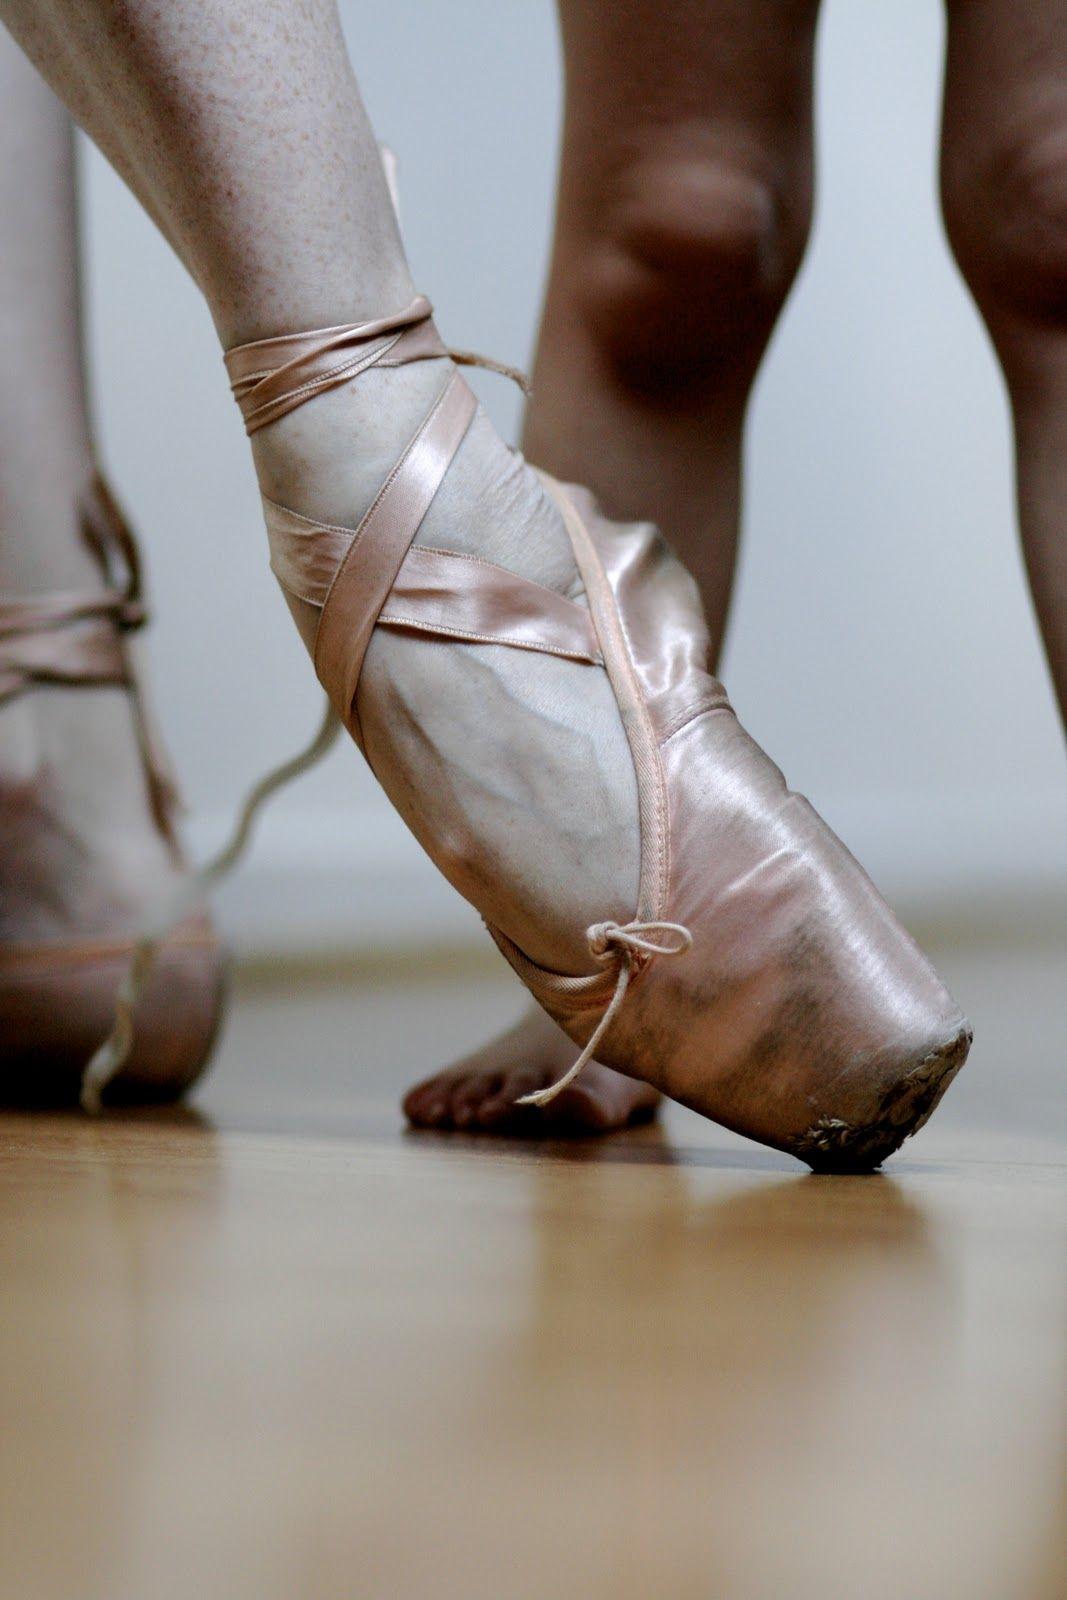 Congratulate, ballerina giving ballet slipper footjob interesting question